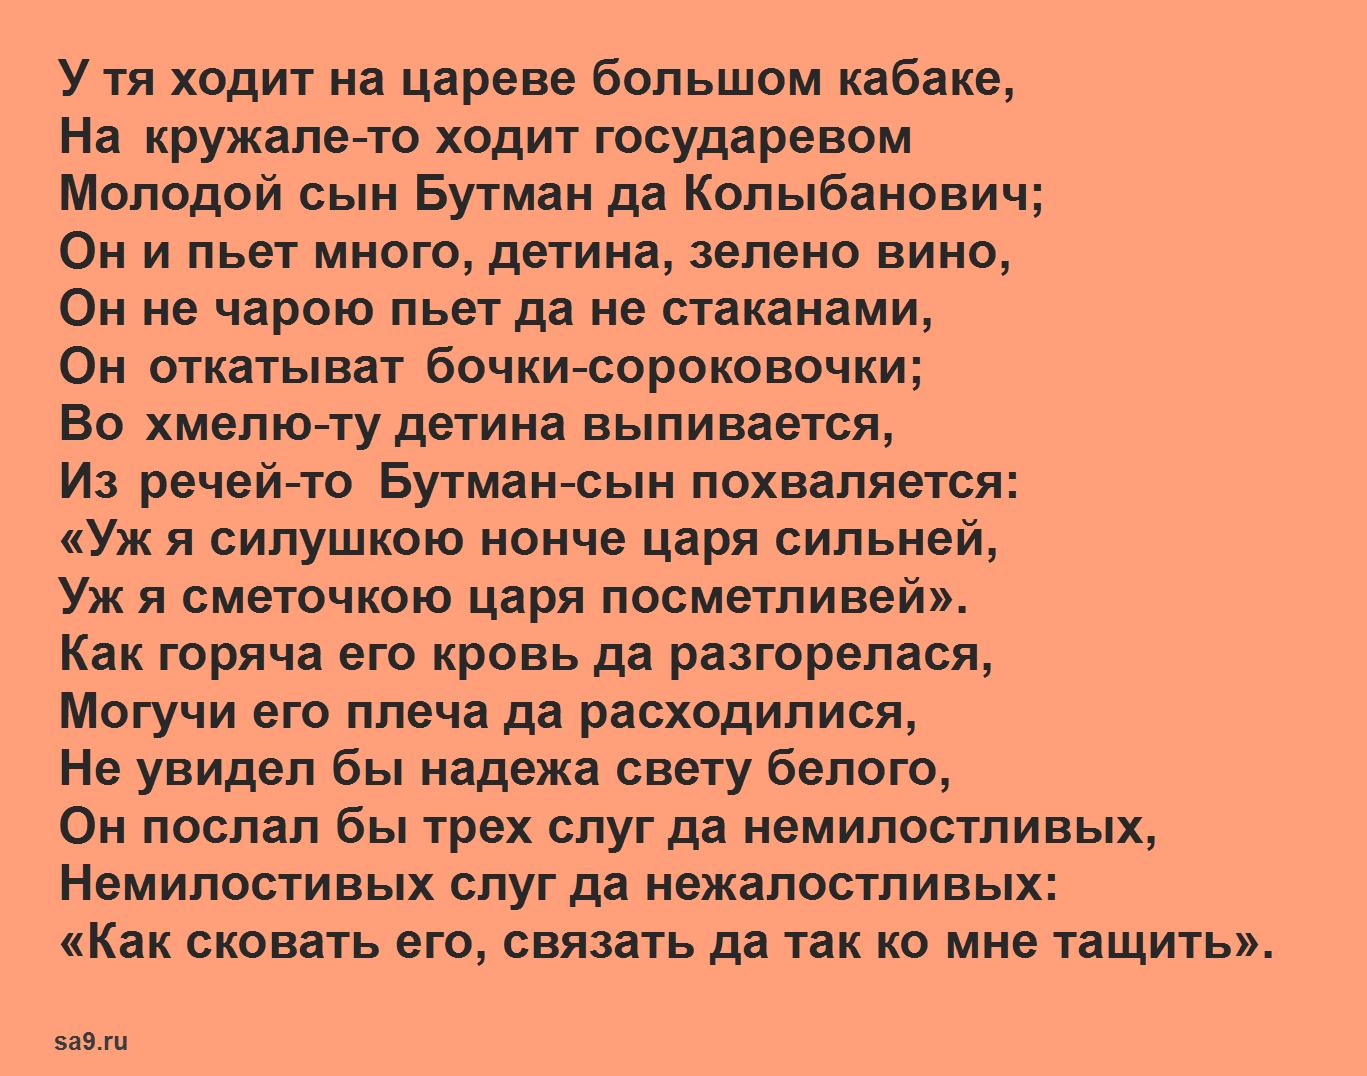 Читать былину - Бутман Колыбанович